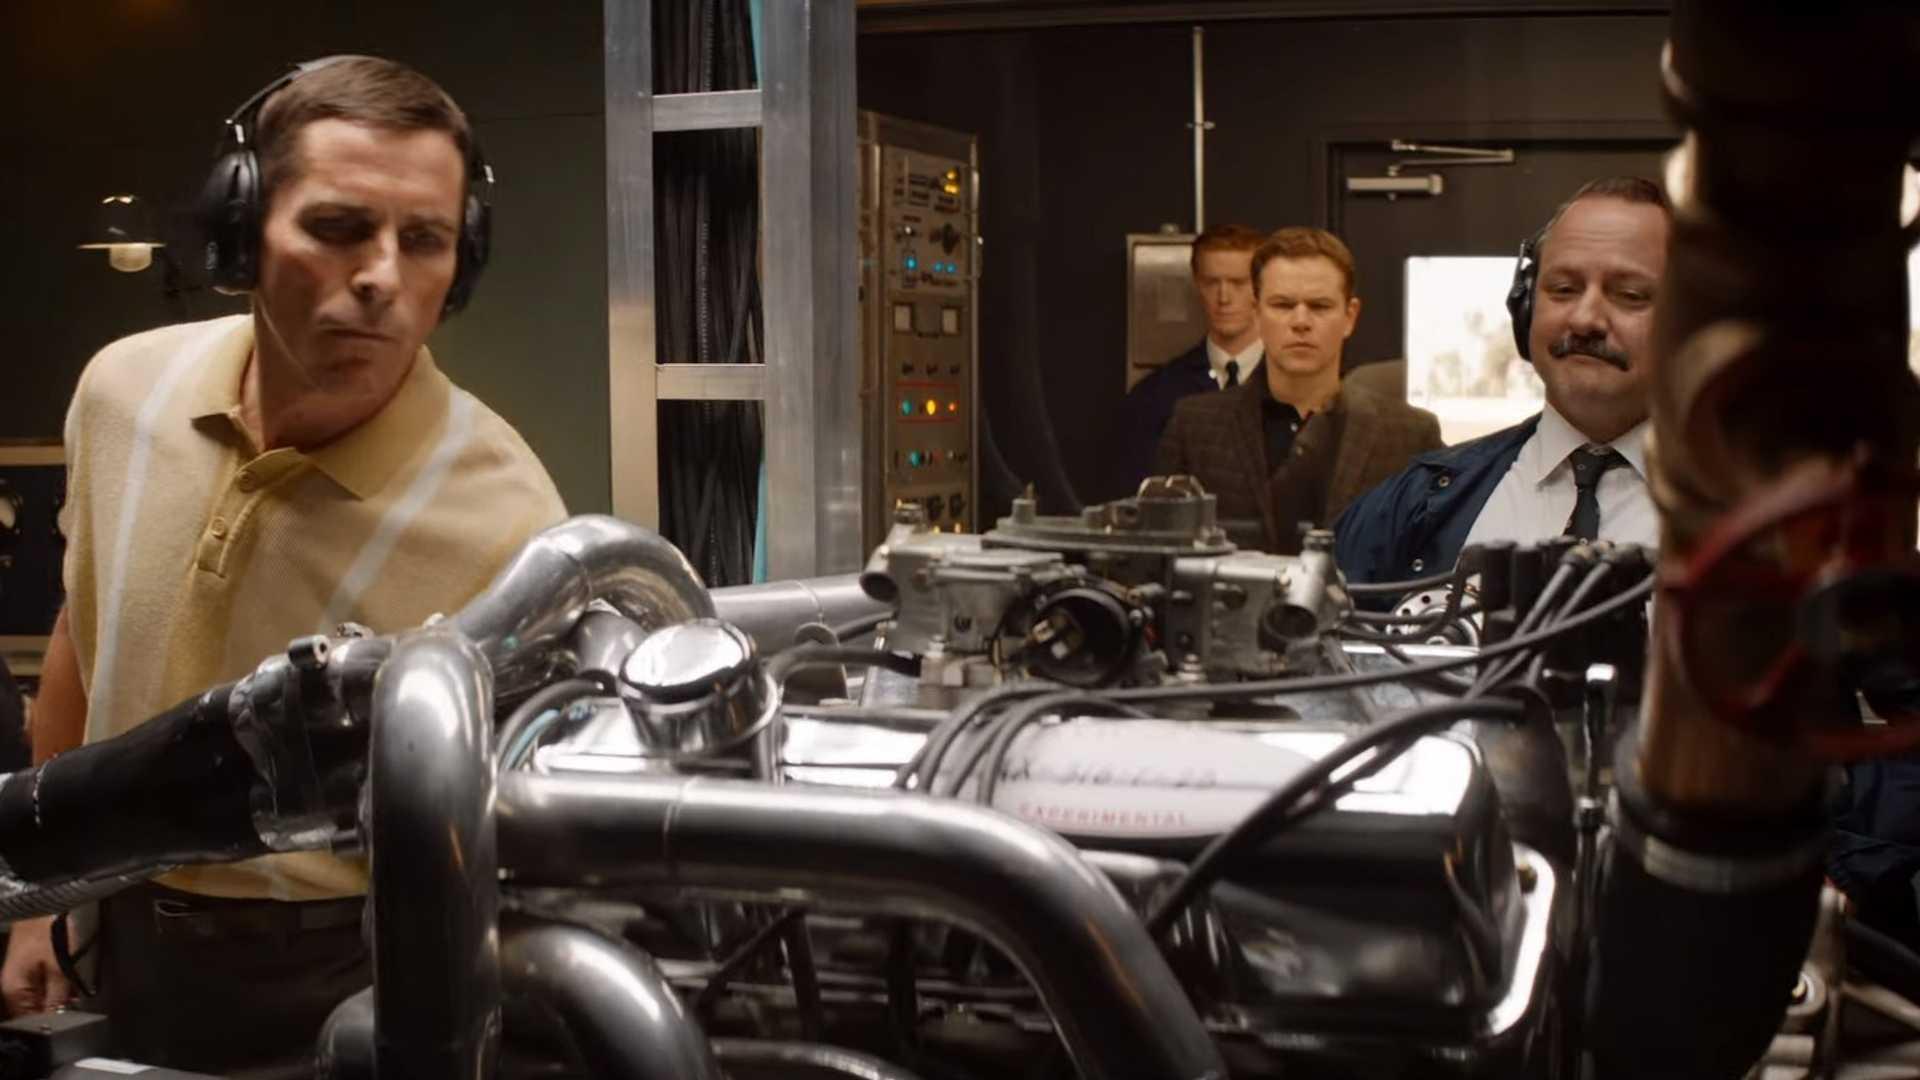 Le Mans '66 - La Grande Sfida: una scena del film